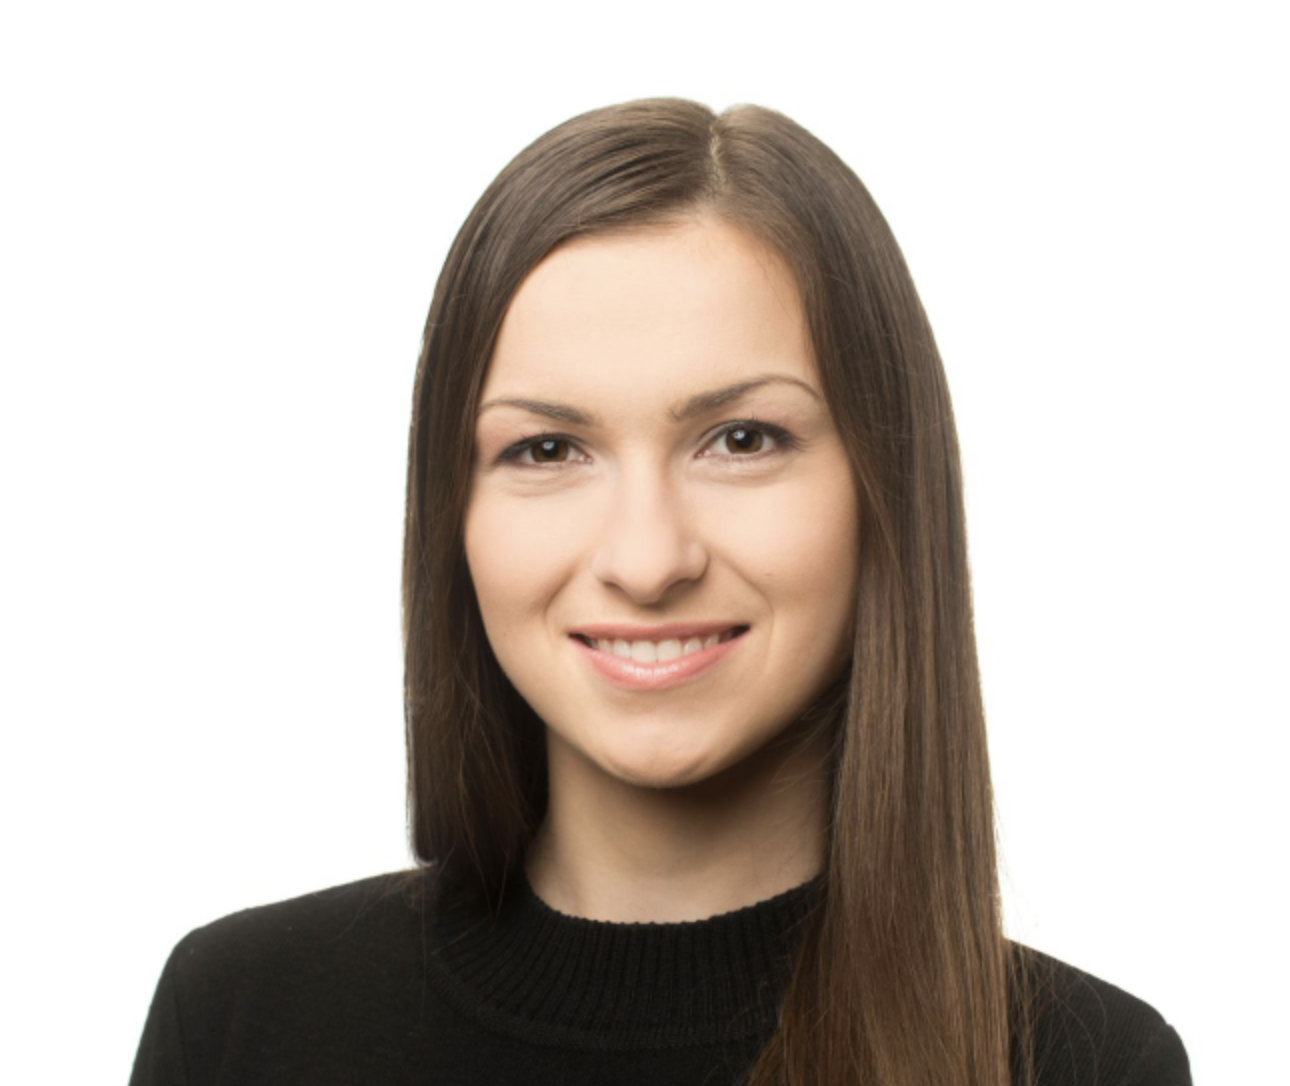 Kristina Jerjomina, Eesti Kaubandus-Tööstuskoja jurist